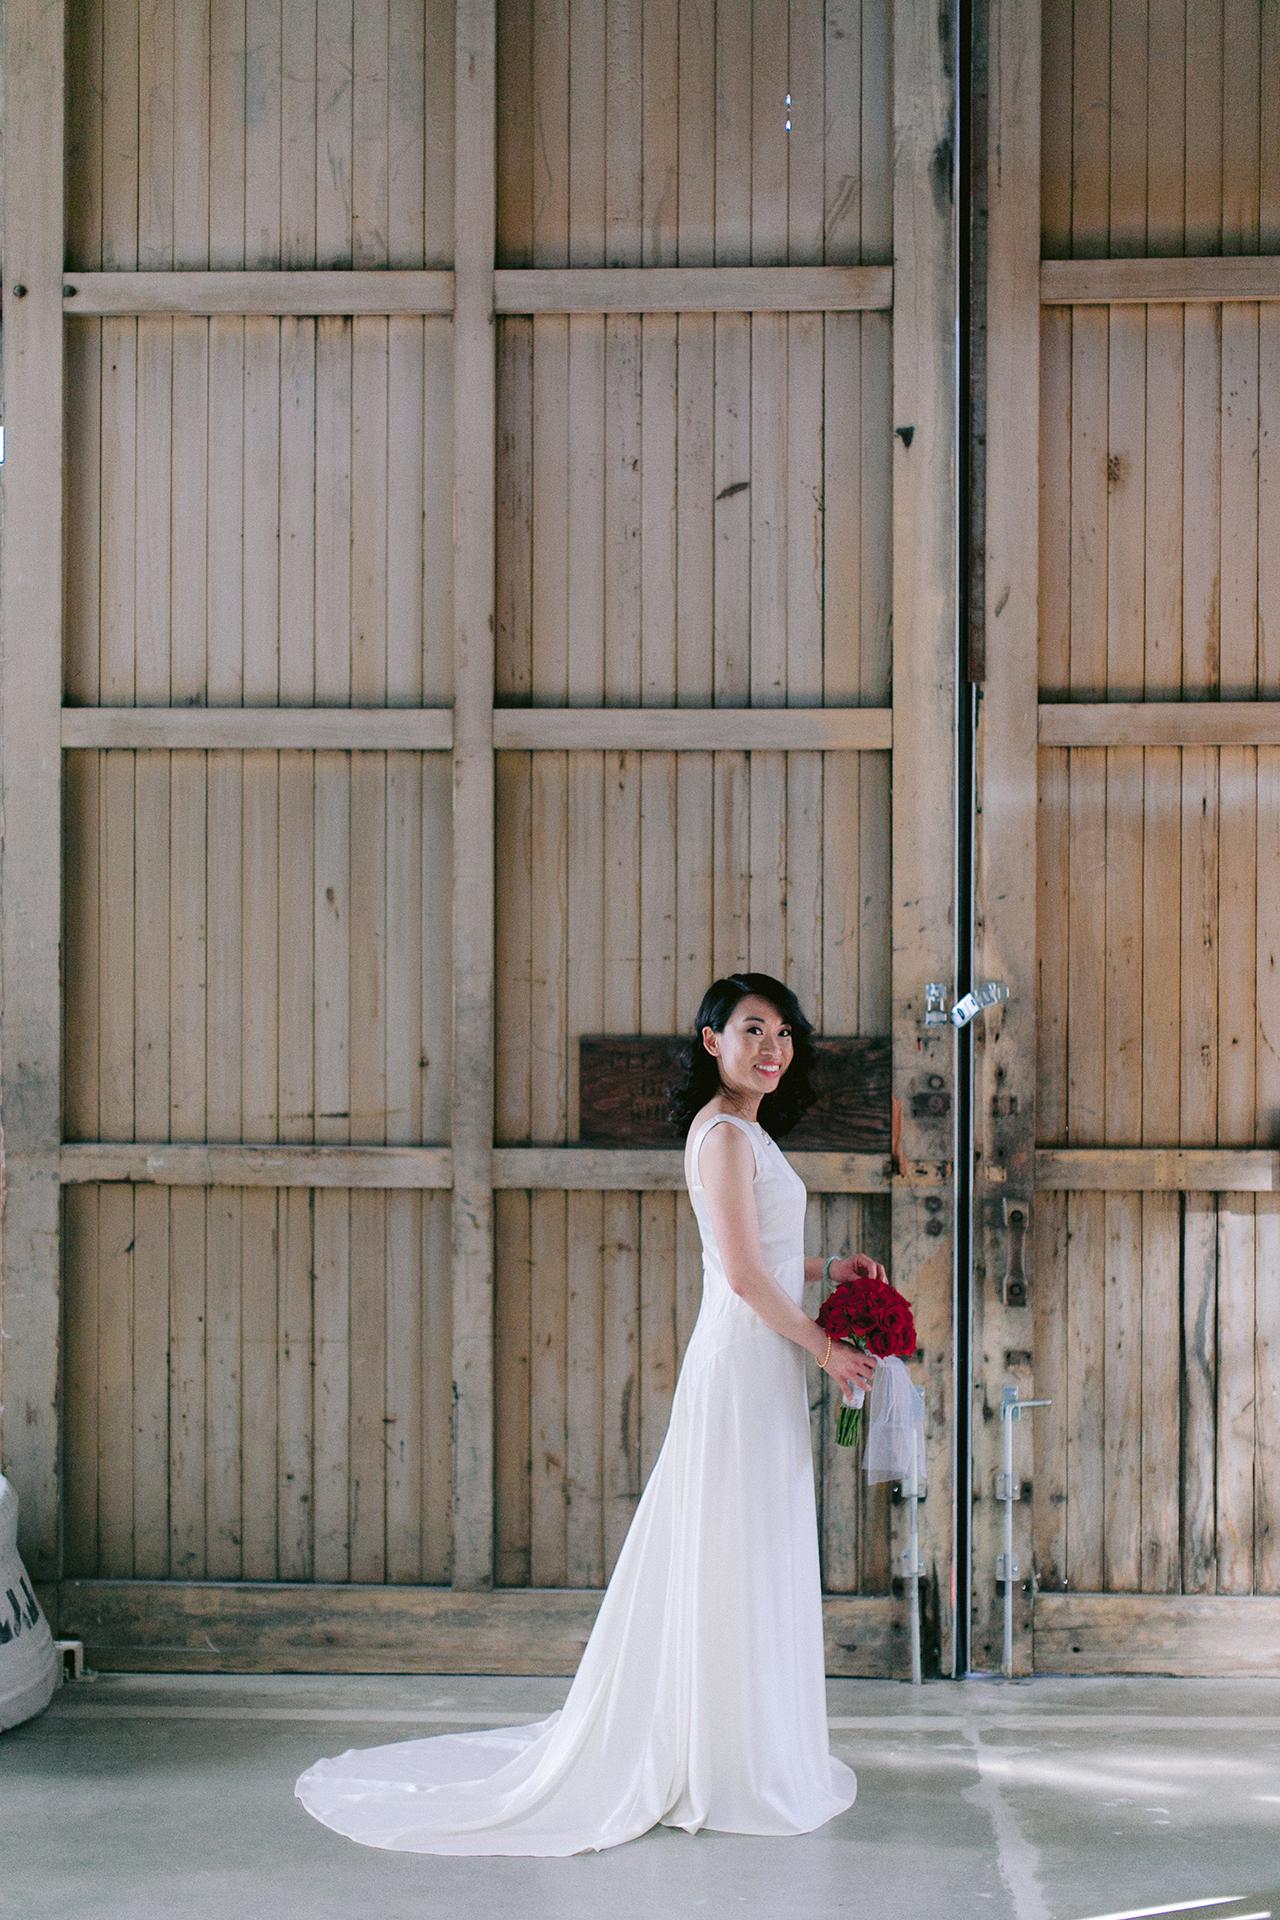 Almanac_Barrel_House_Wedding_009.jpg